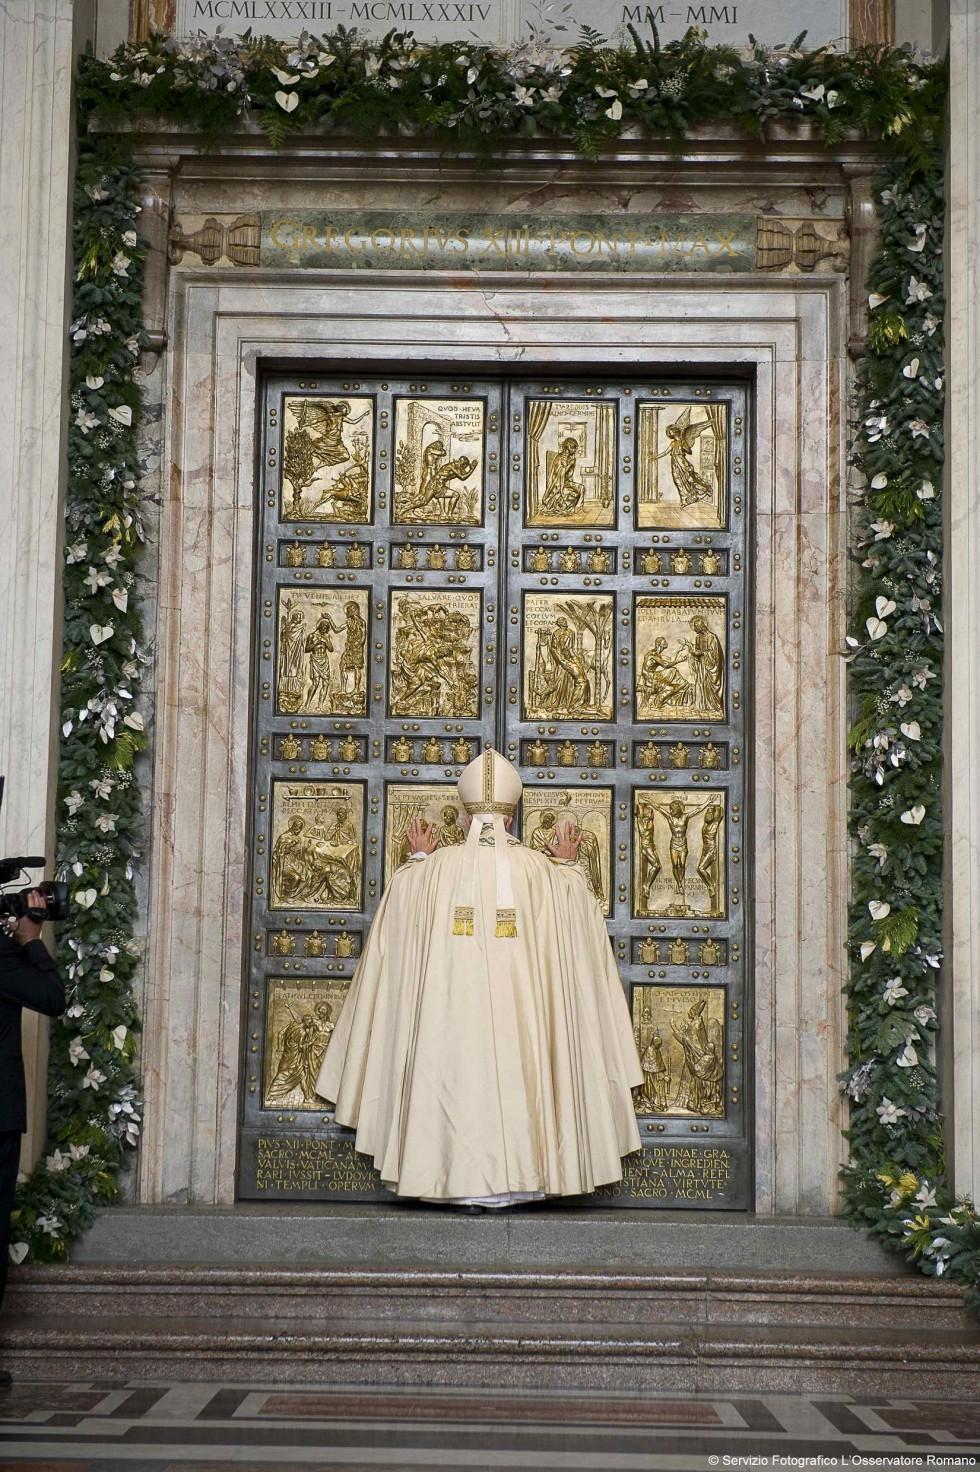 Papa francesco apre la porta santa in vaticano agensir - Immagini porta santa ...